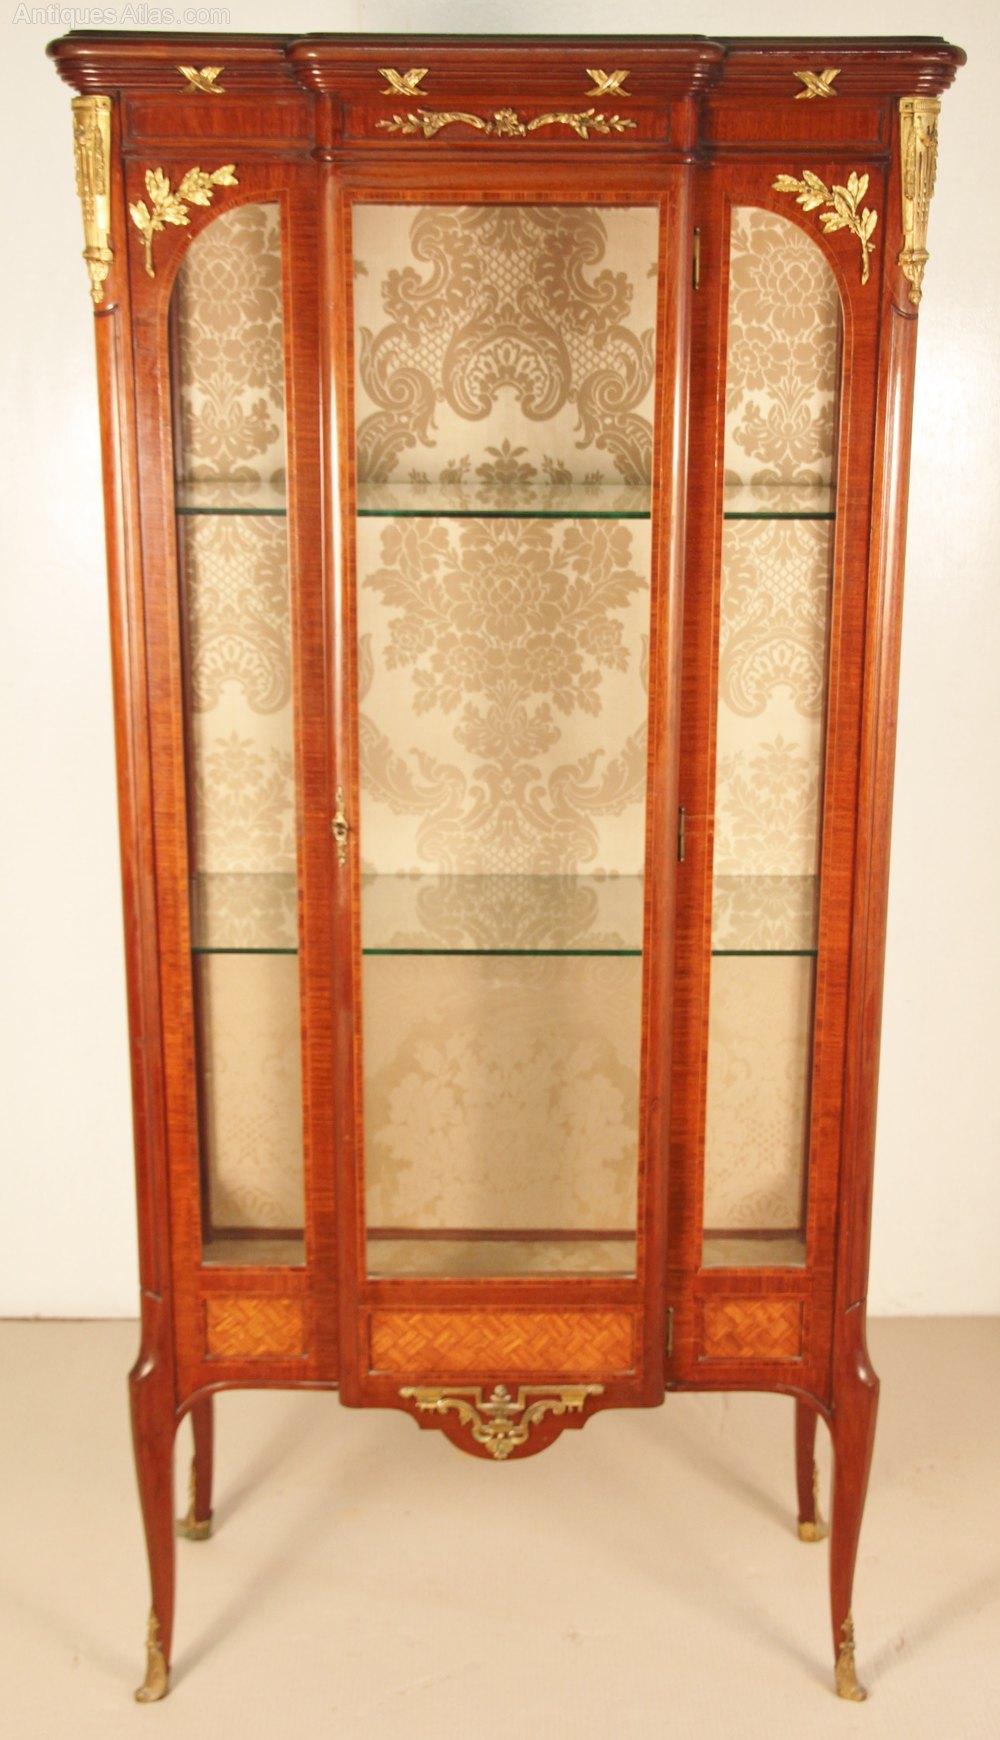 good quality french mahogany vitrine antiques atlas. Black Bedroom Furniture Sets. Home Design Ideas